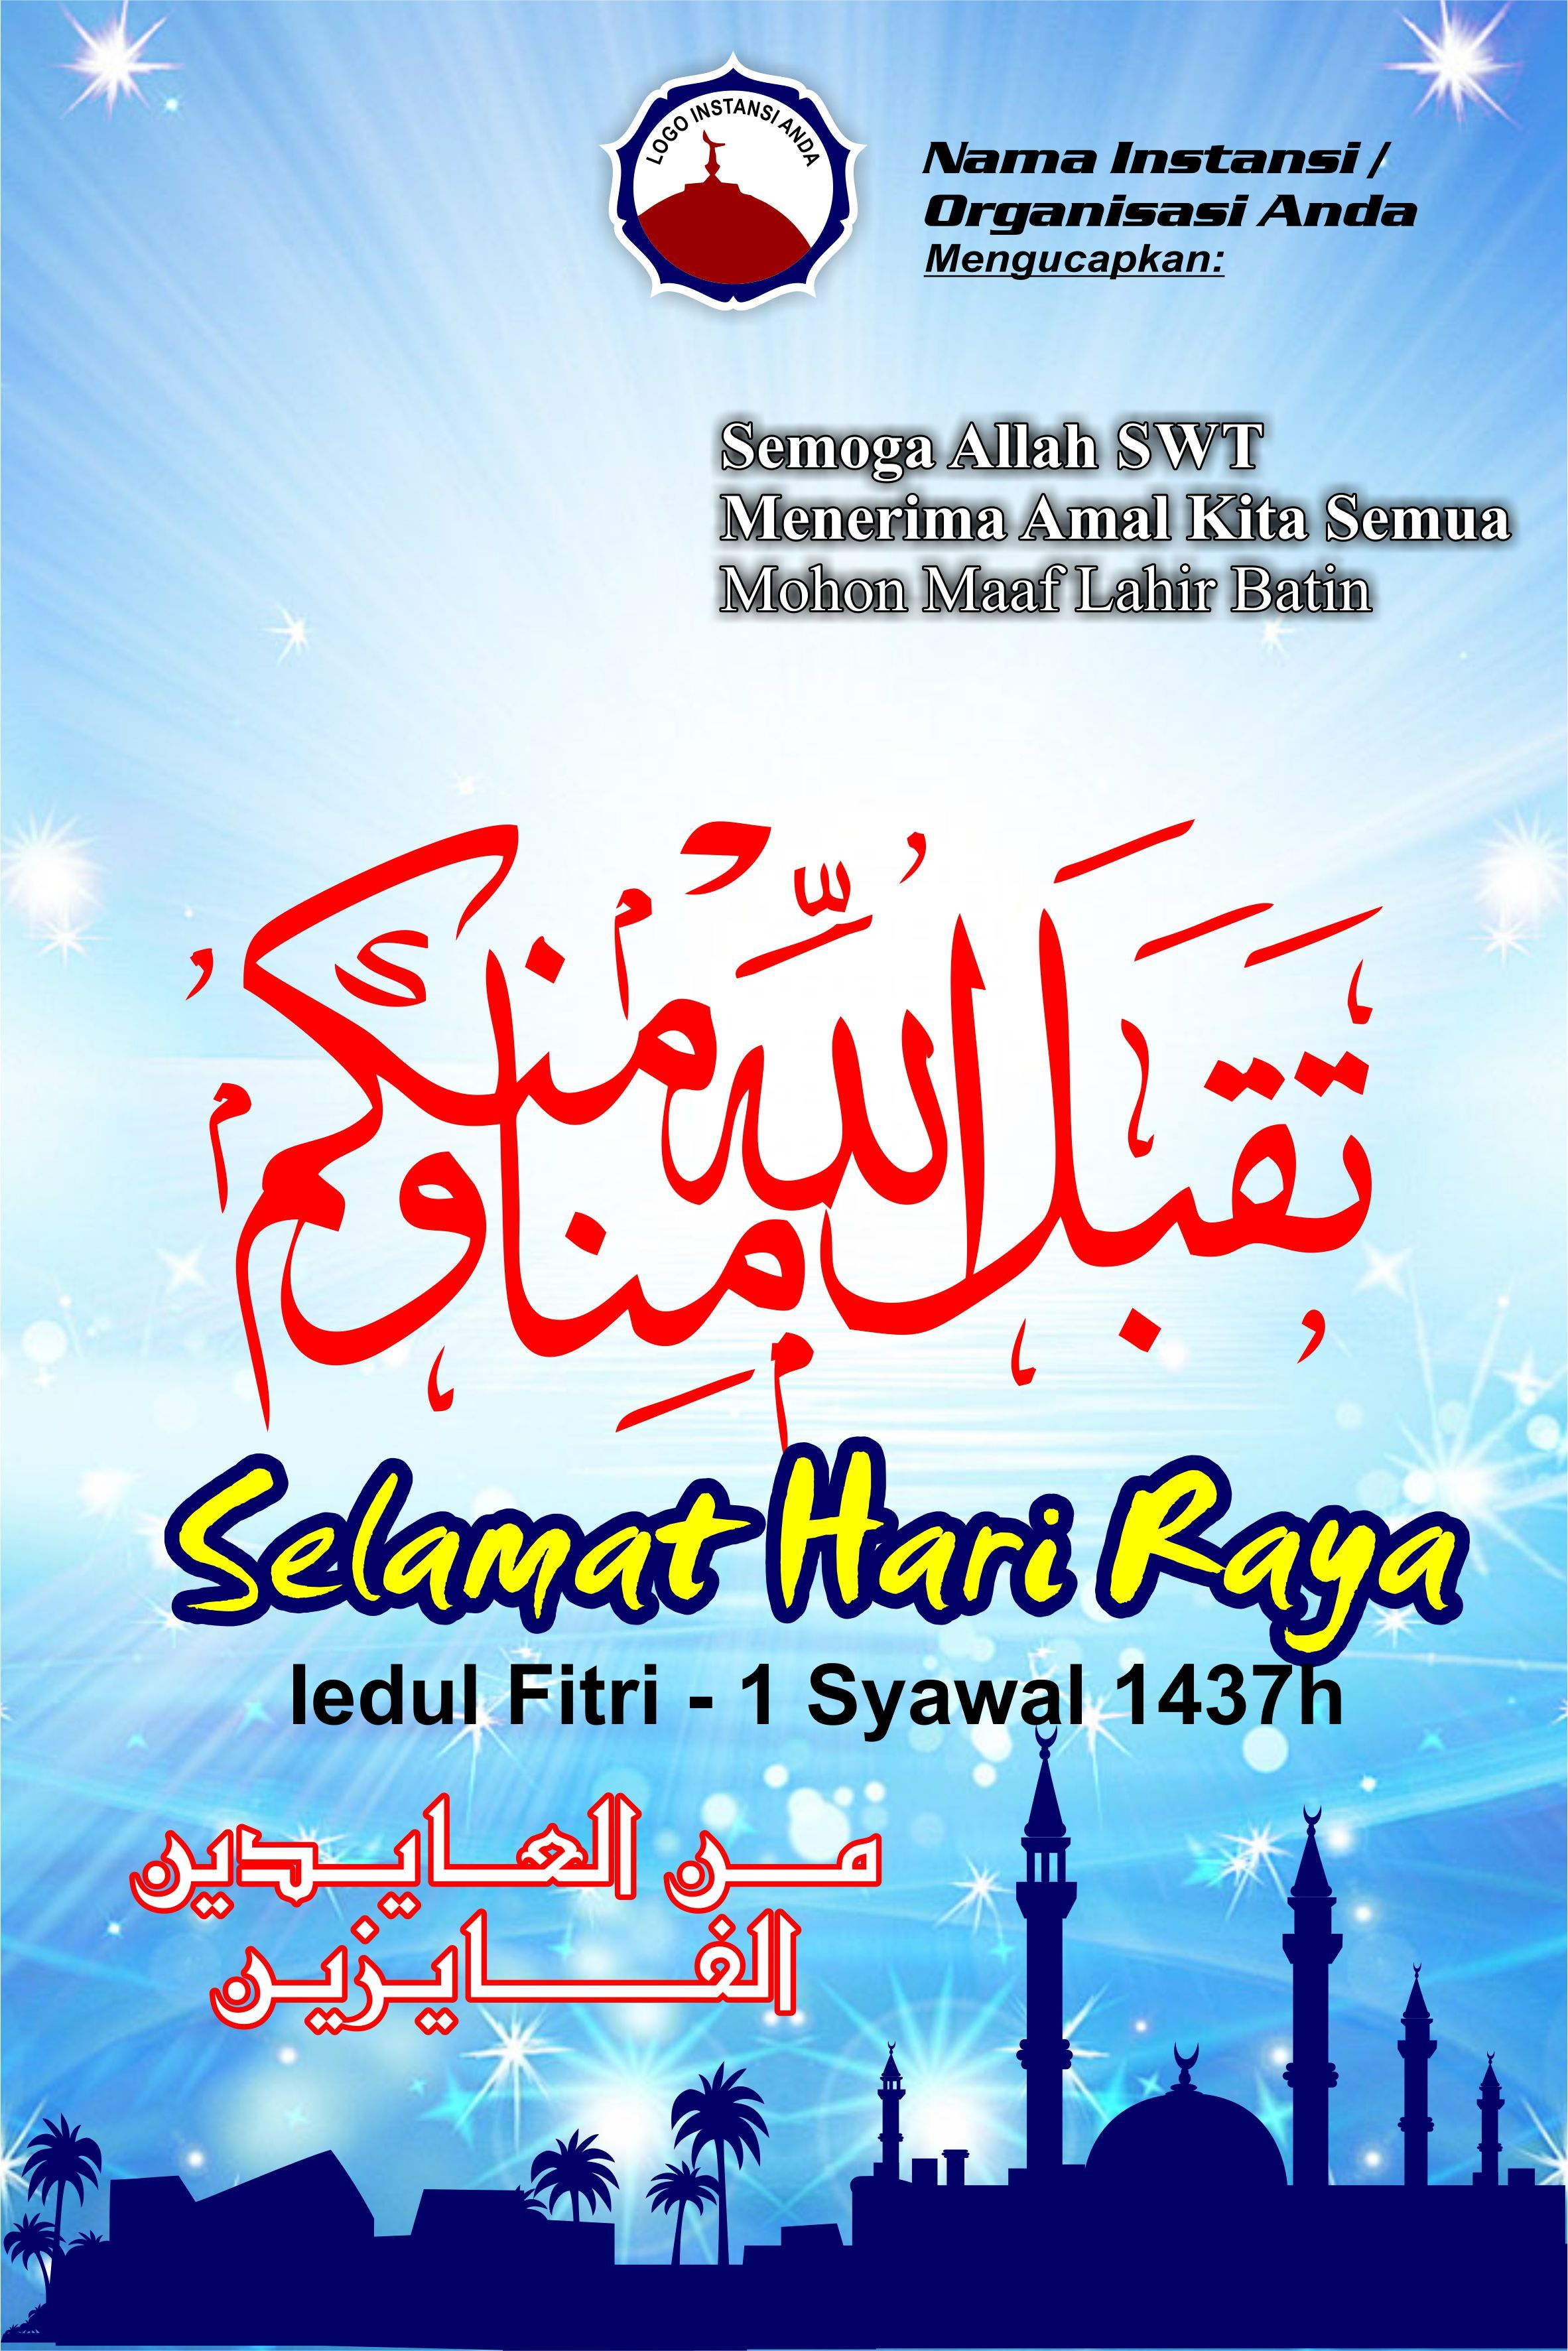 Kumpulan Template Banner Halal Bihalal Cdr Ala Model Kini